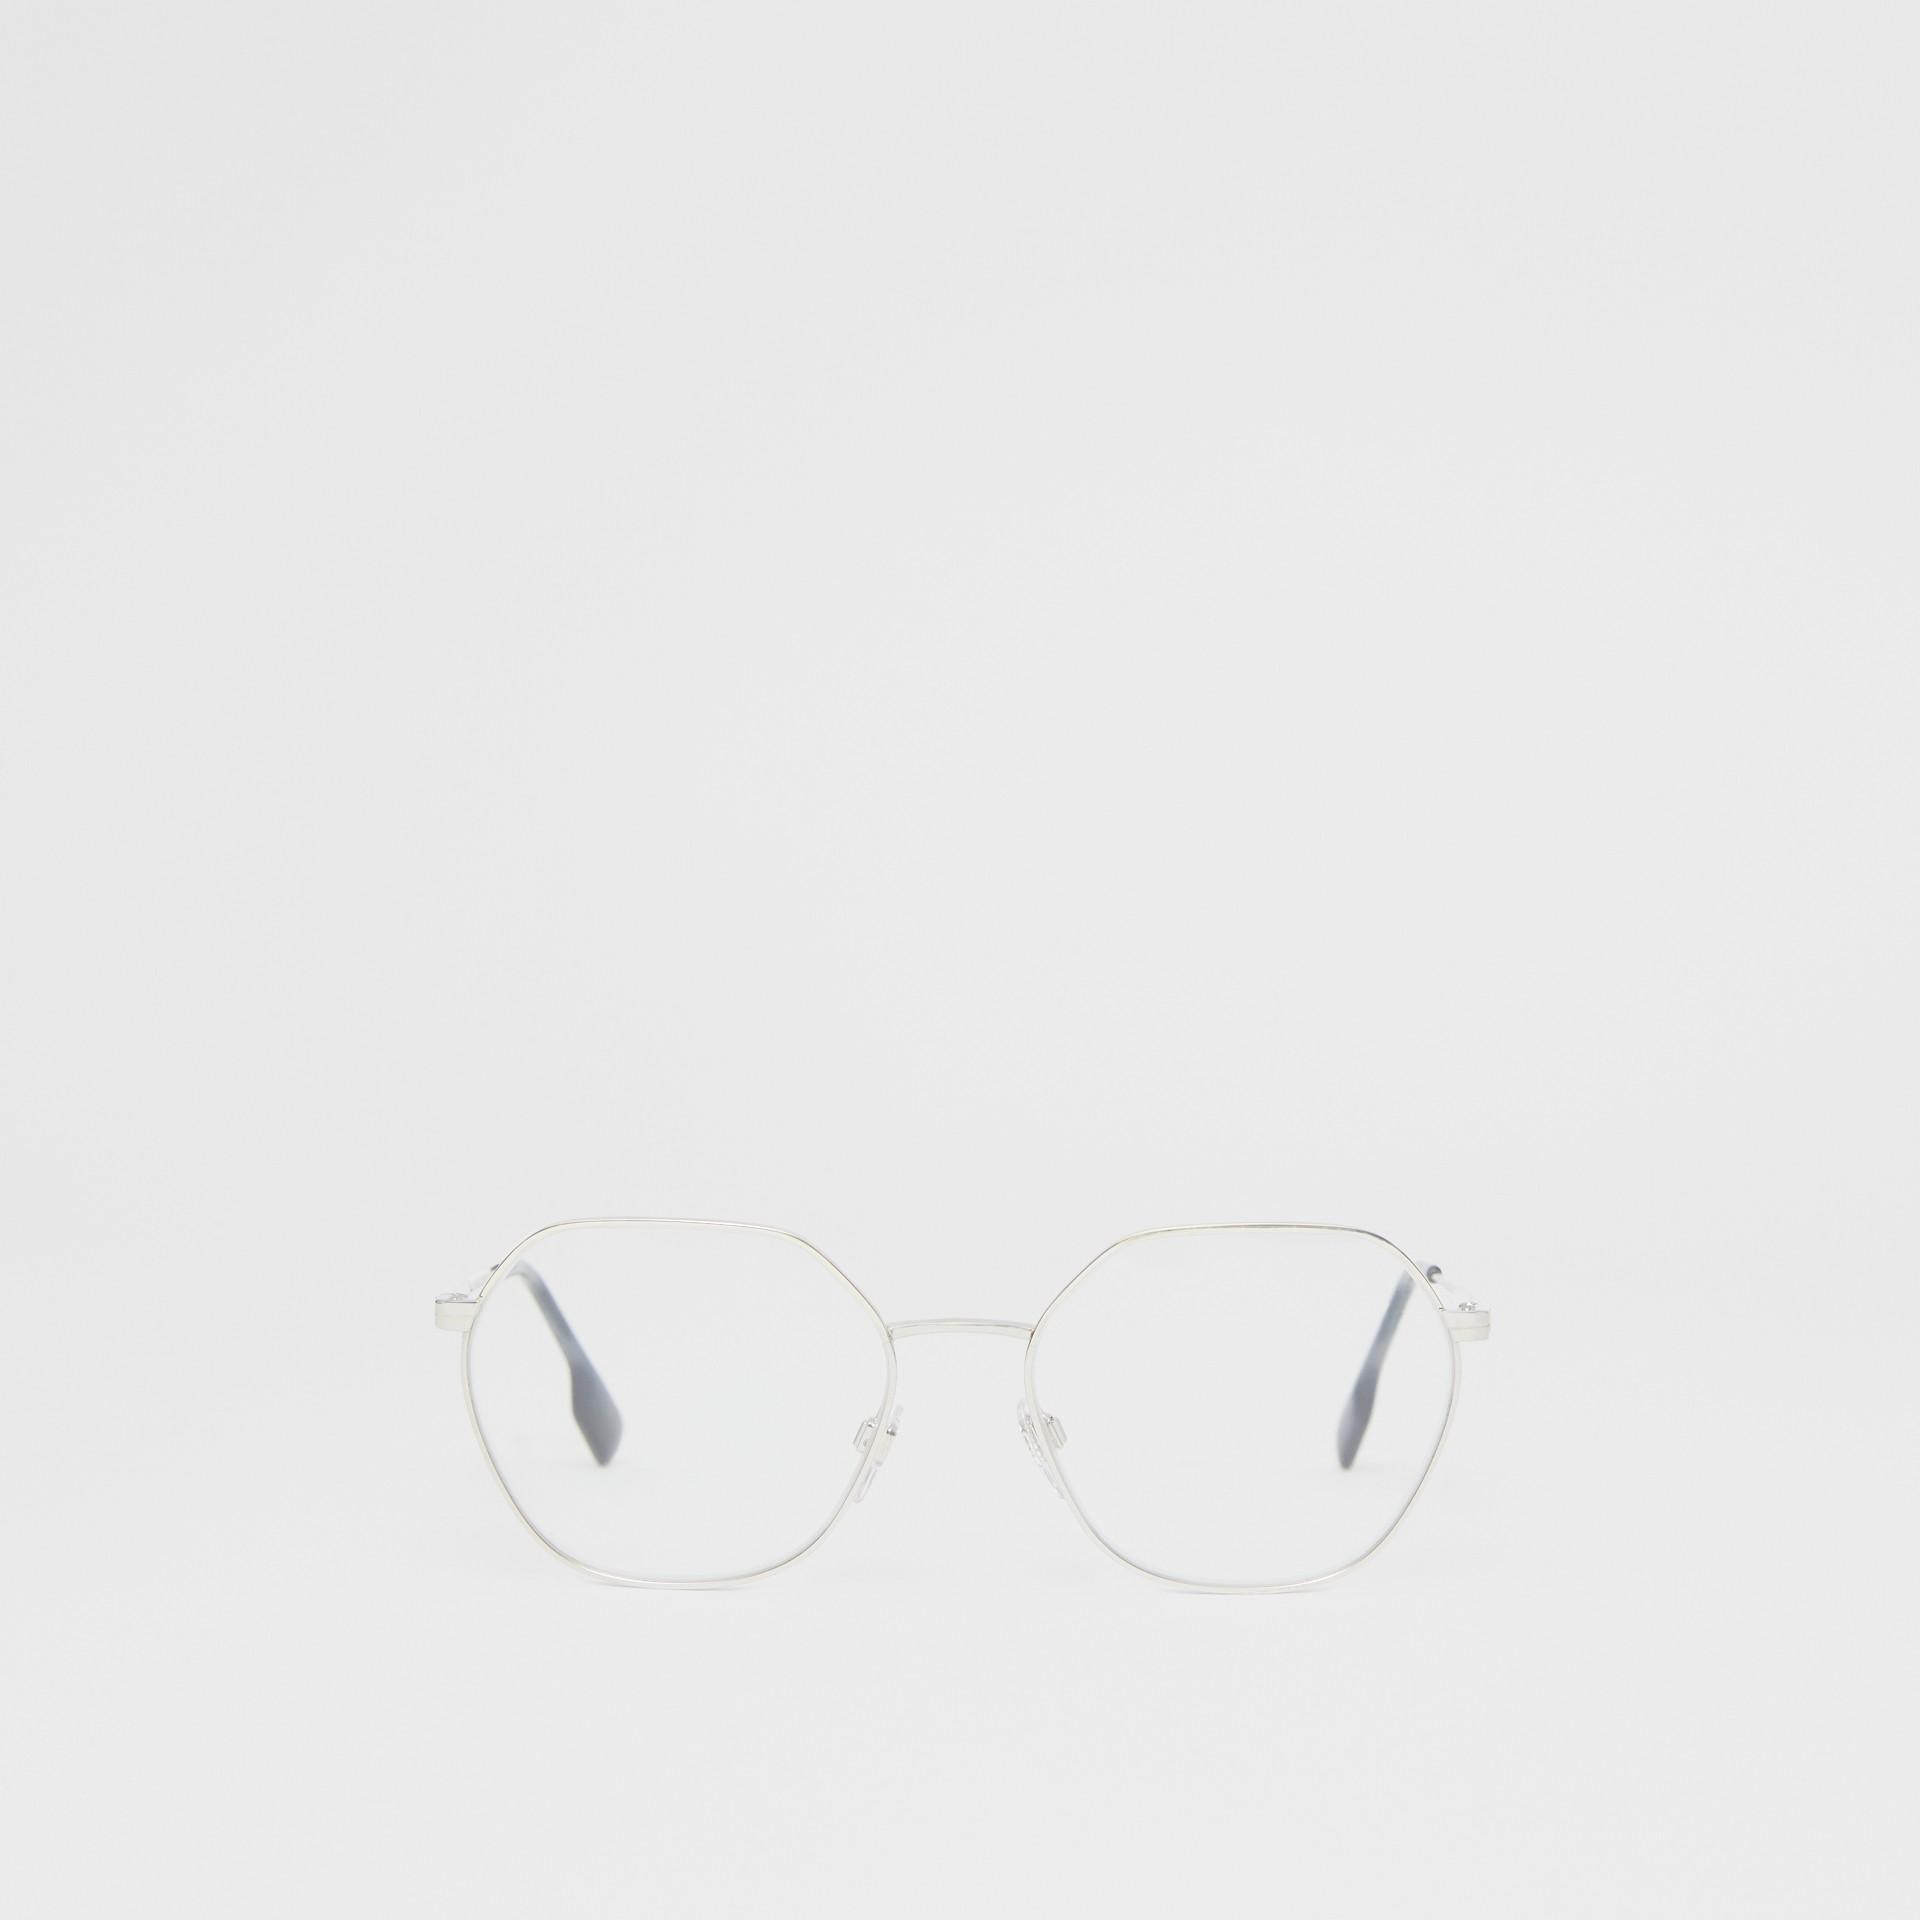 Geometric Optical Frames in Grey Tortoiseshell - Women | Burberry - gallery image 0